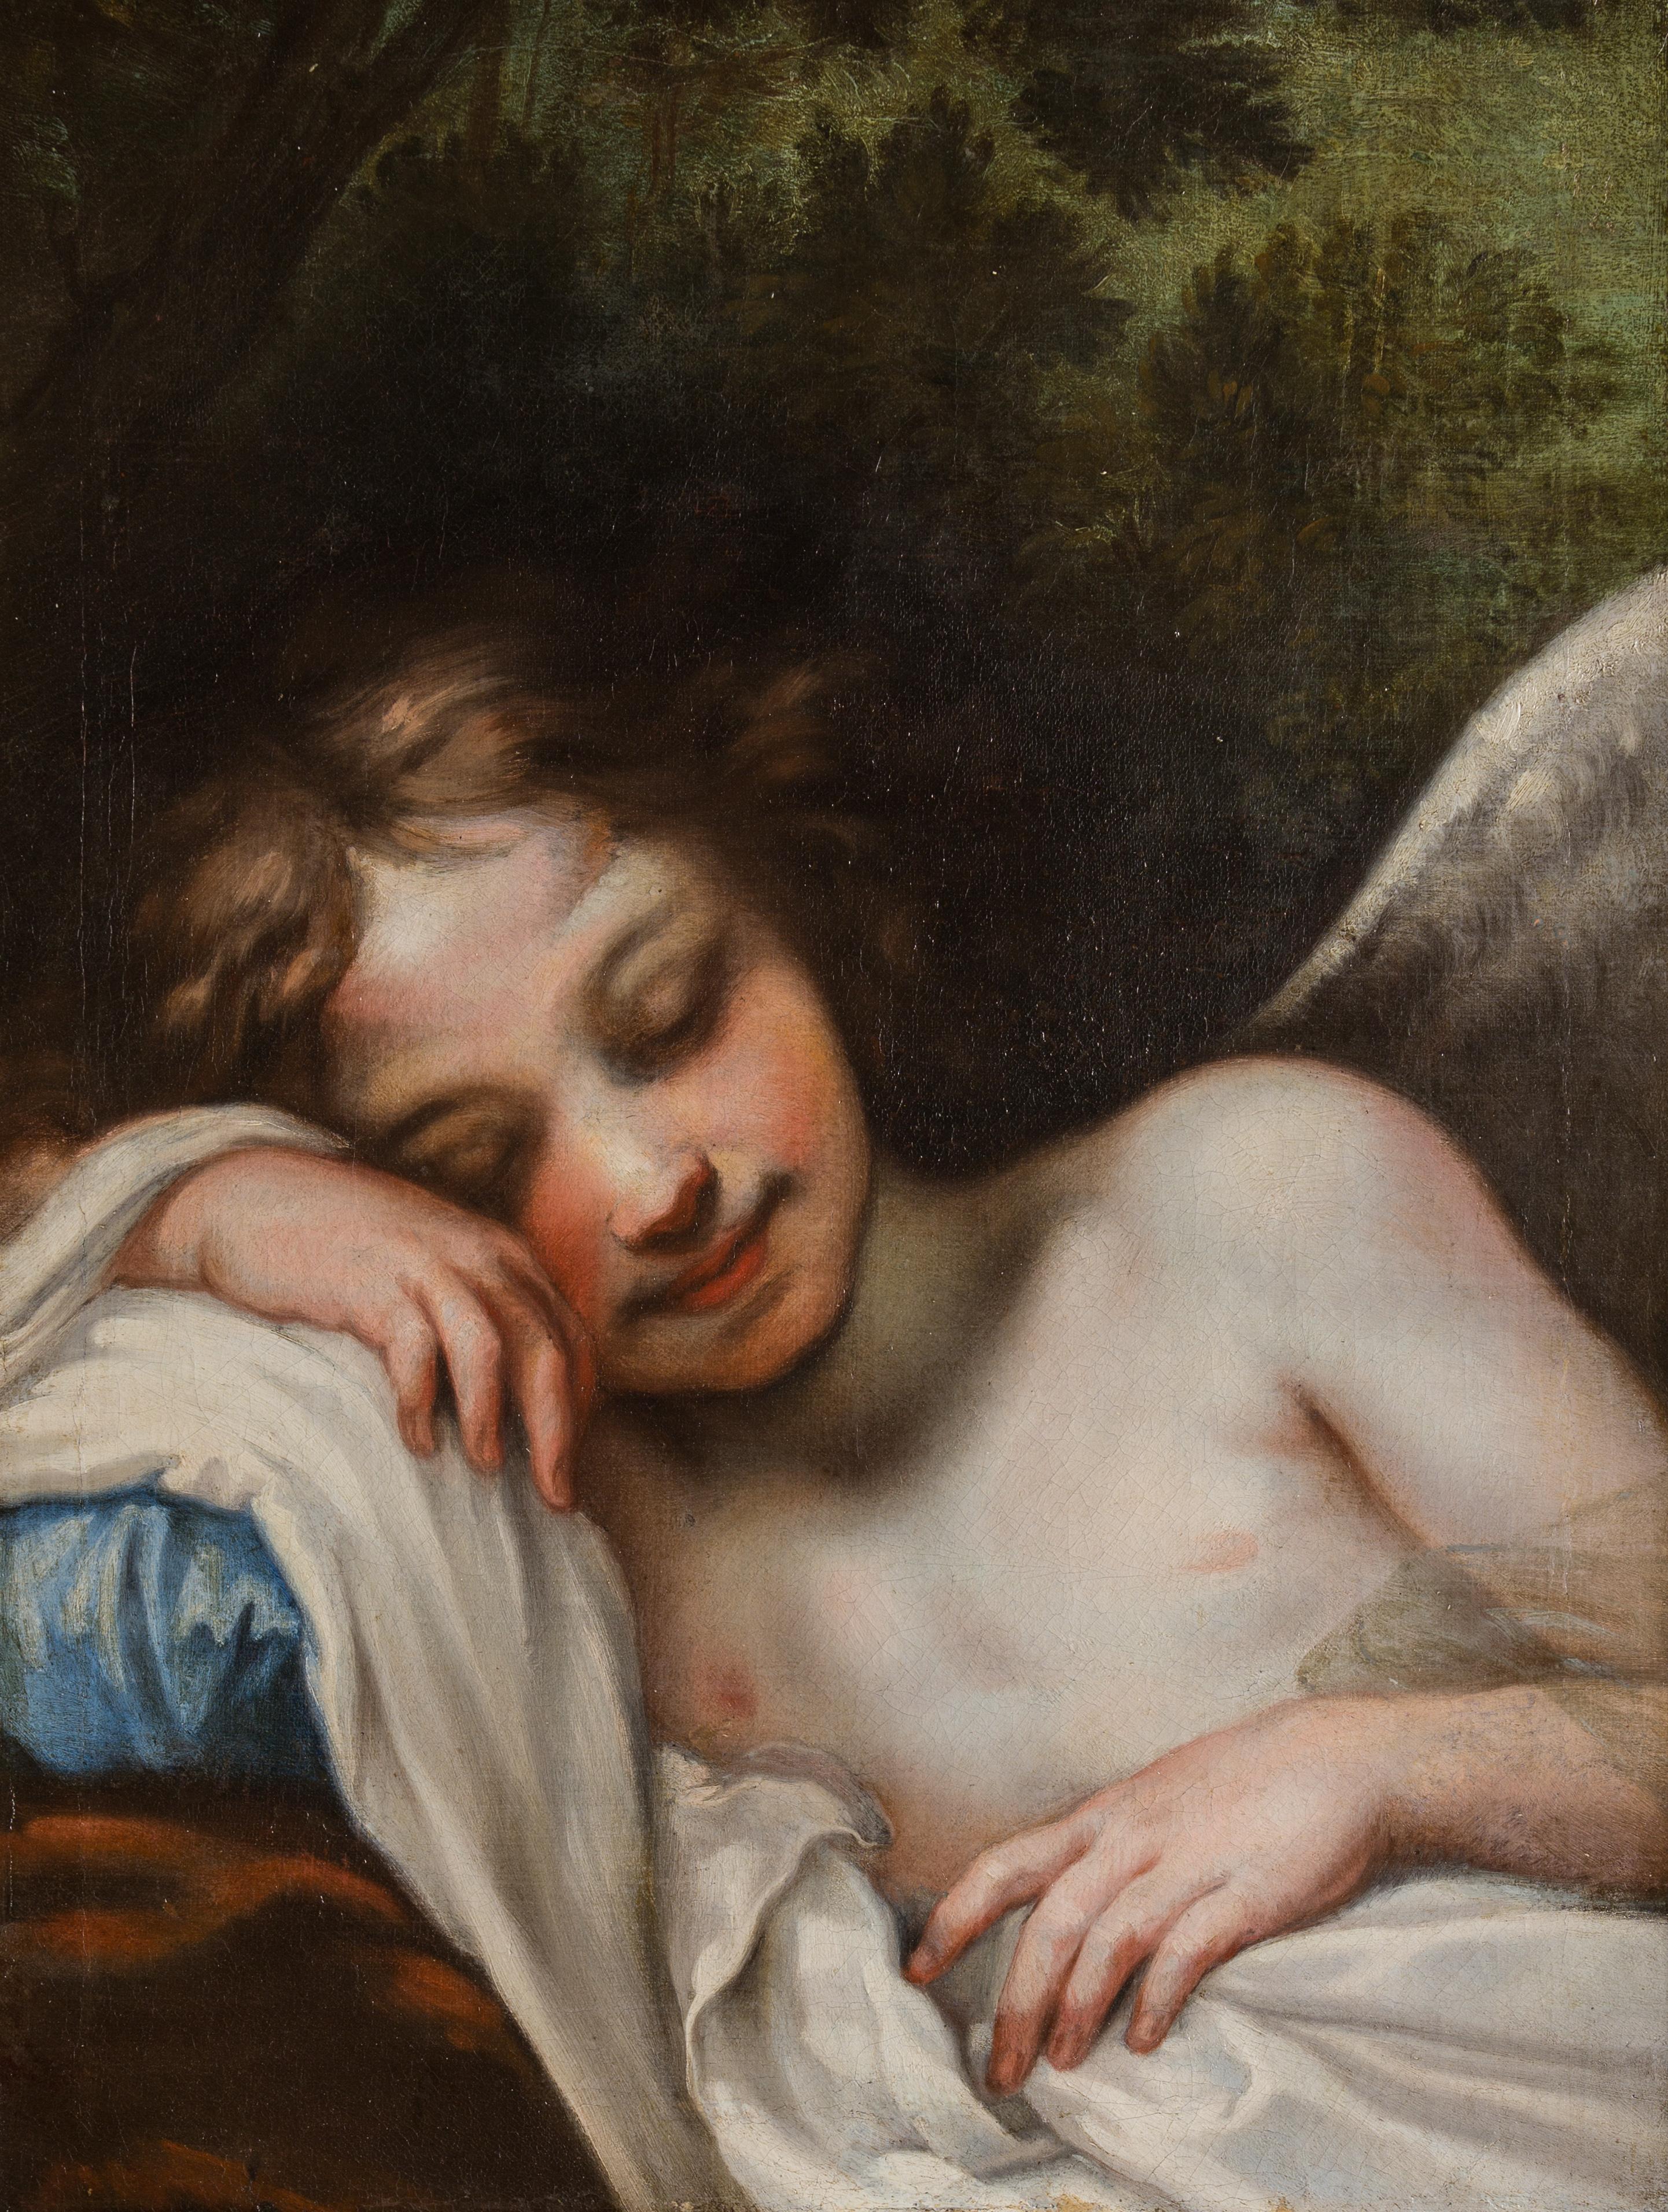 A Sleeping Cupid, by Baldassare Franceschini (1611-1690).